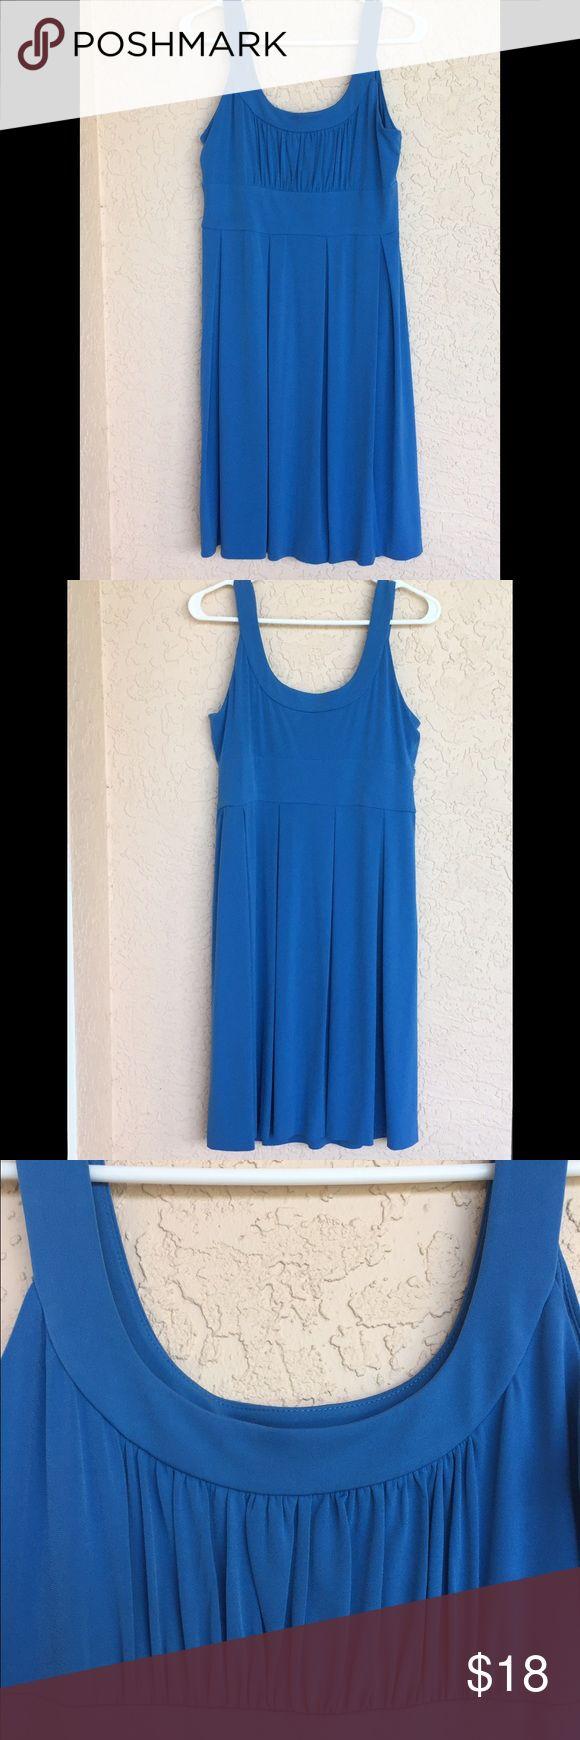 Donna Ricco blue dress Donna Ricco blue sleeveless mini dress. Donna Ricco Dresses Mini